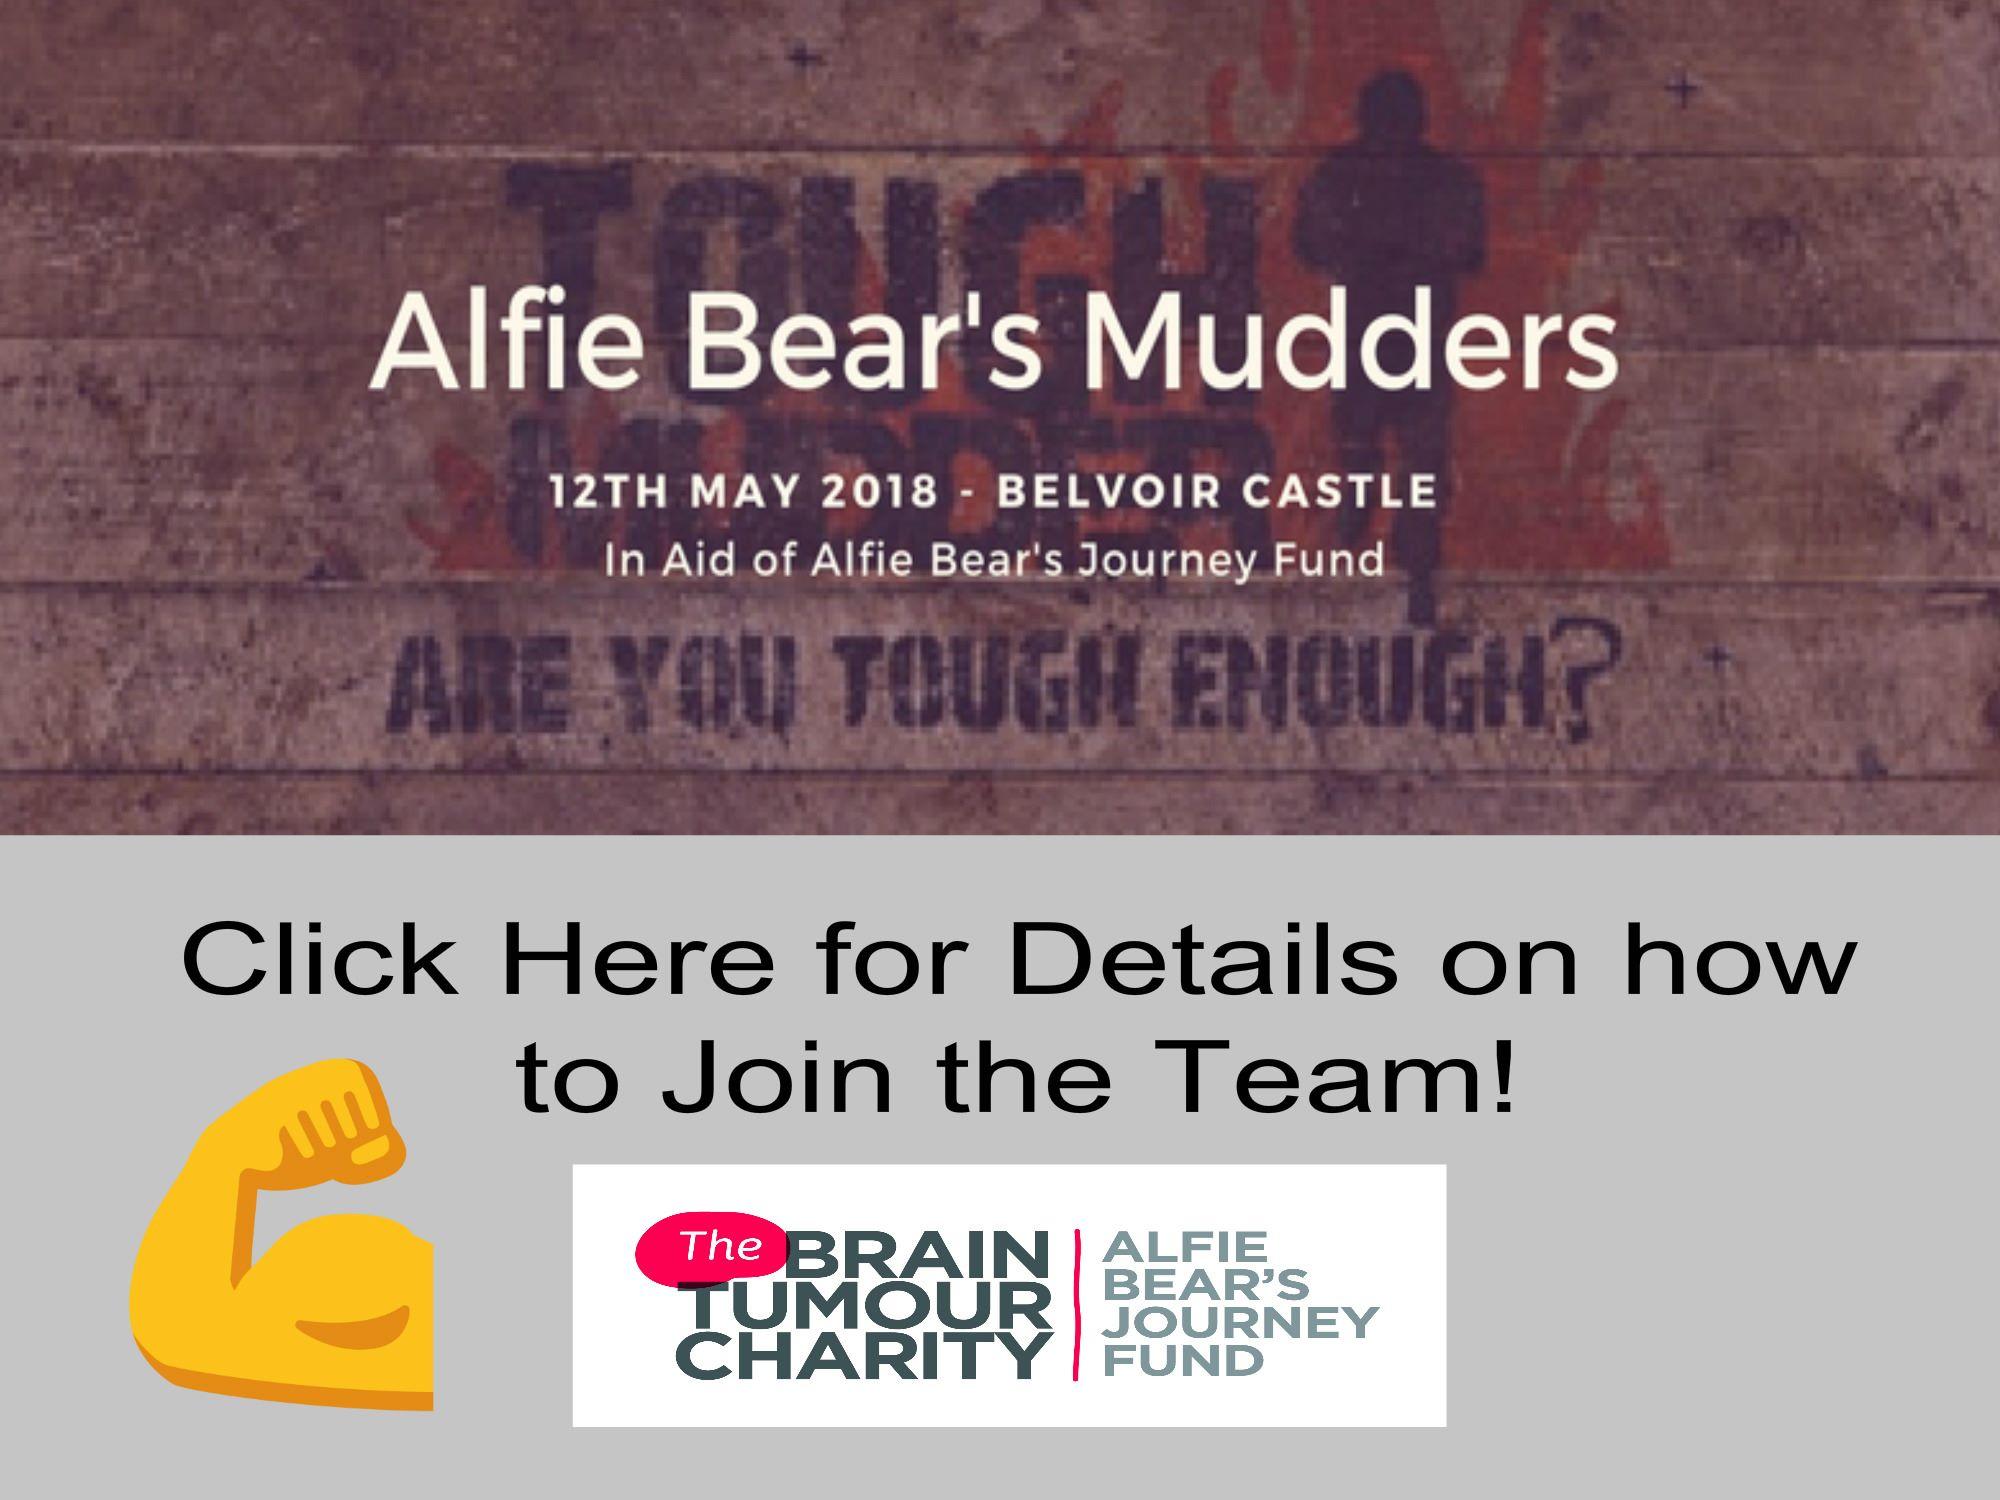 Alfie Bear's Mudders Challenge